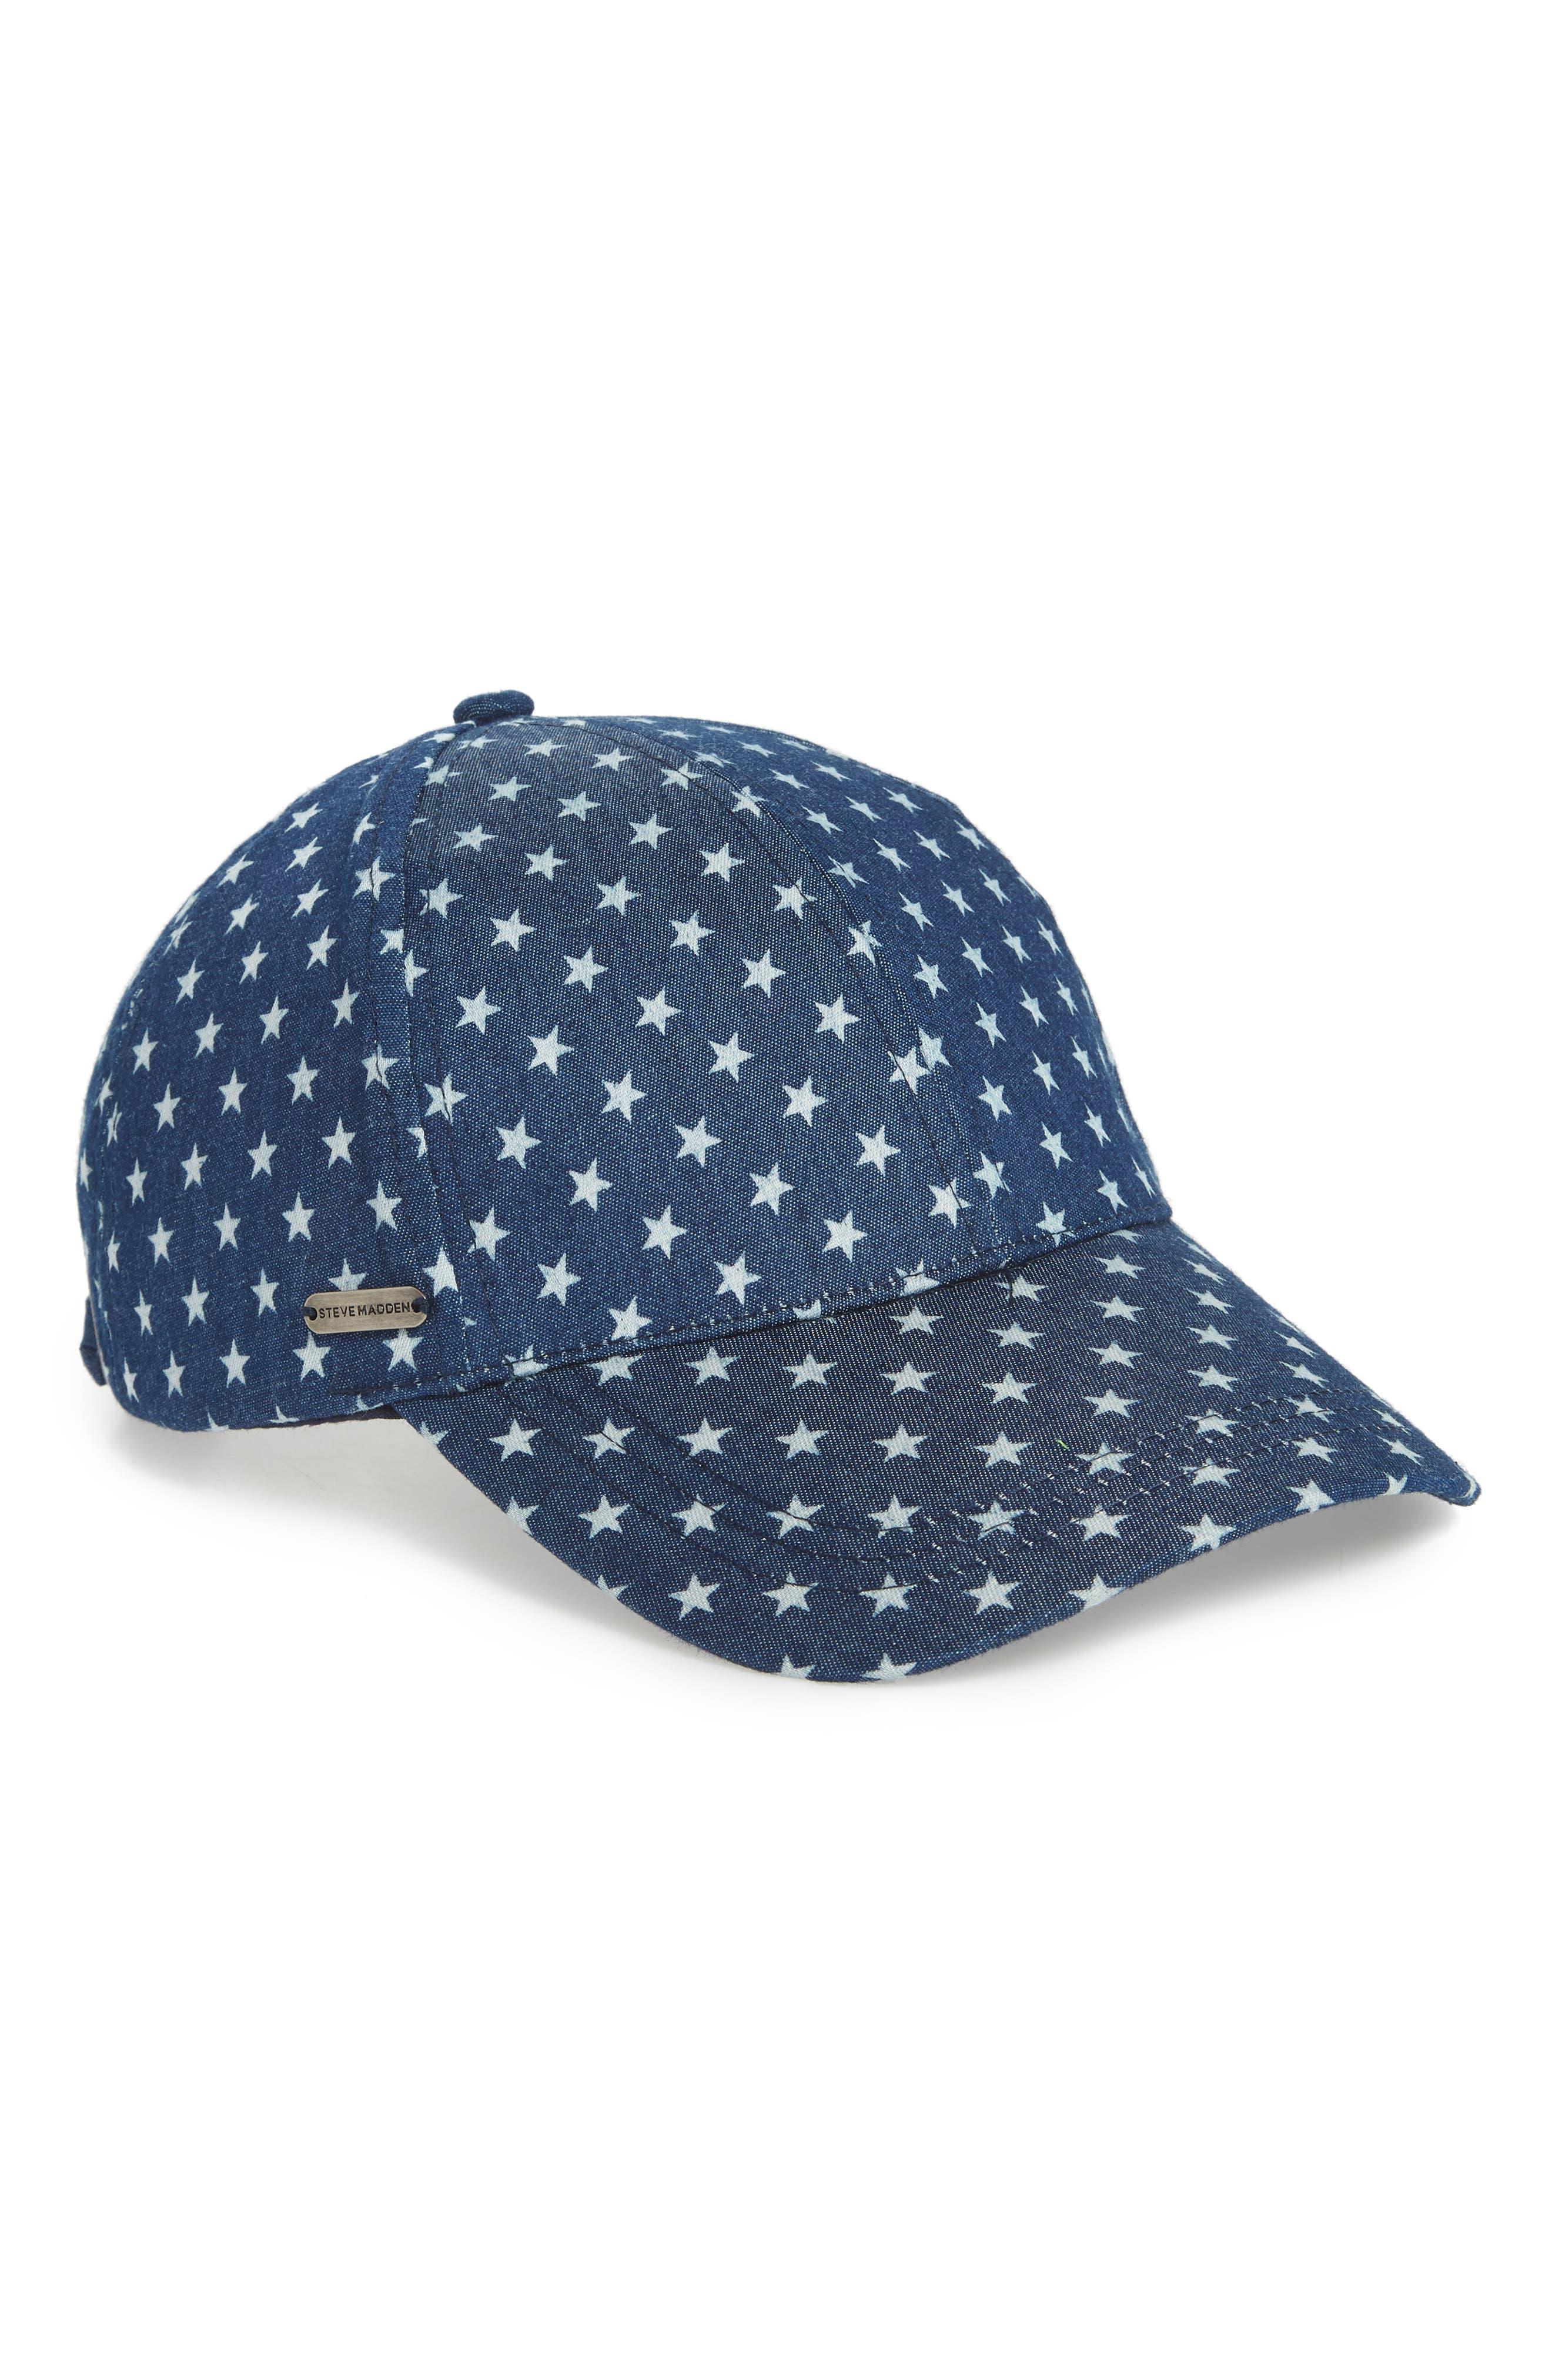 Lucky Stars Baseball Cap,                         Main,                         color, 400